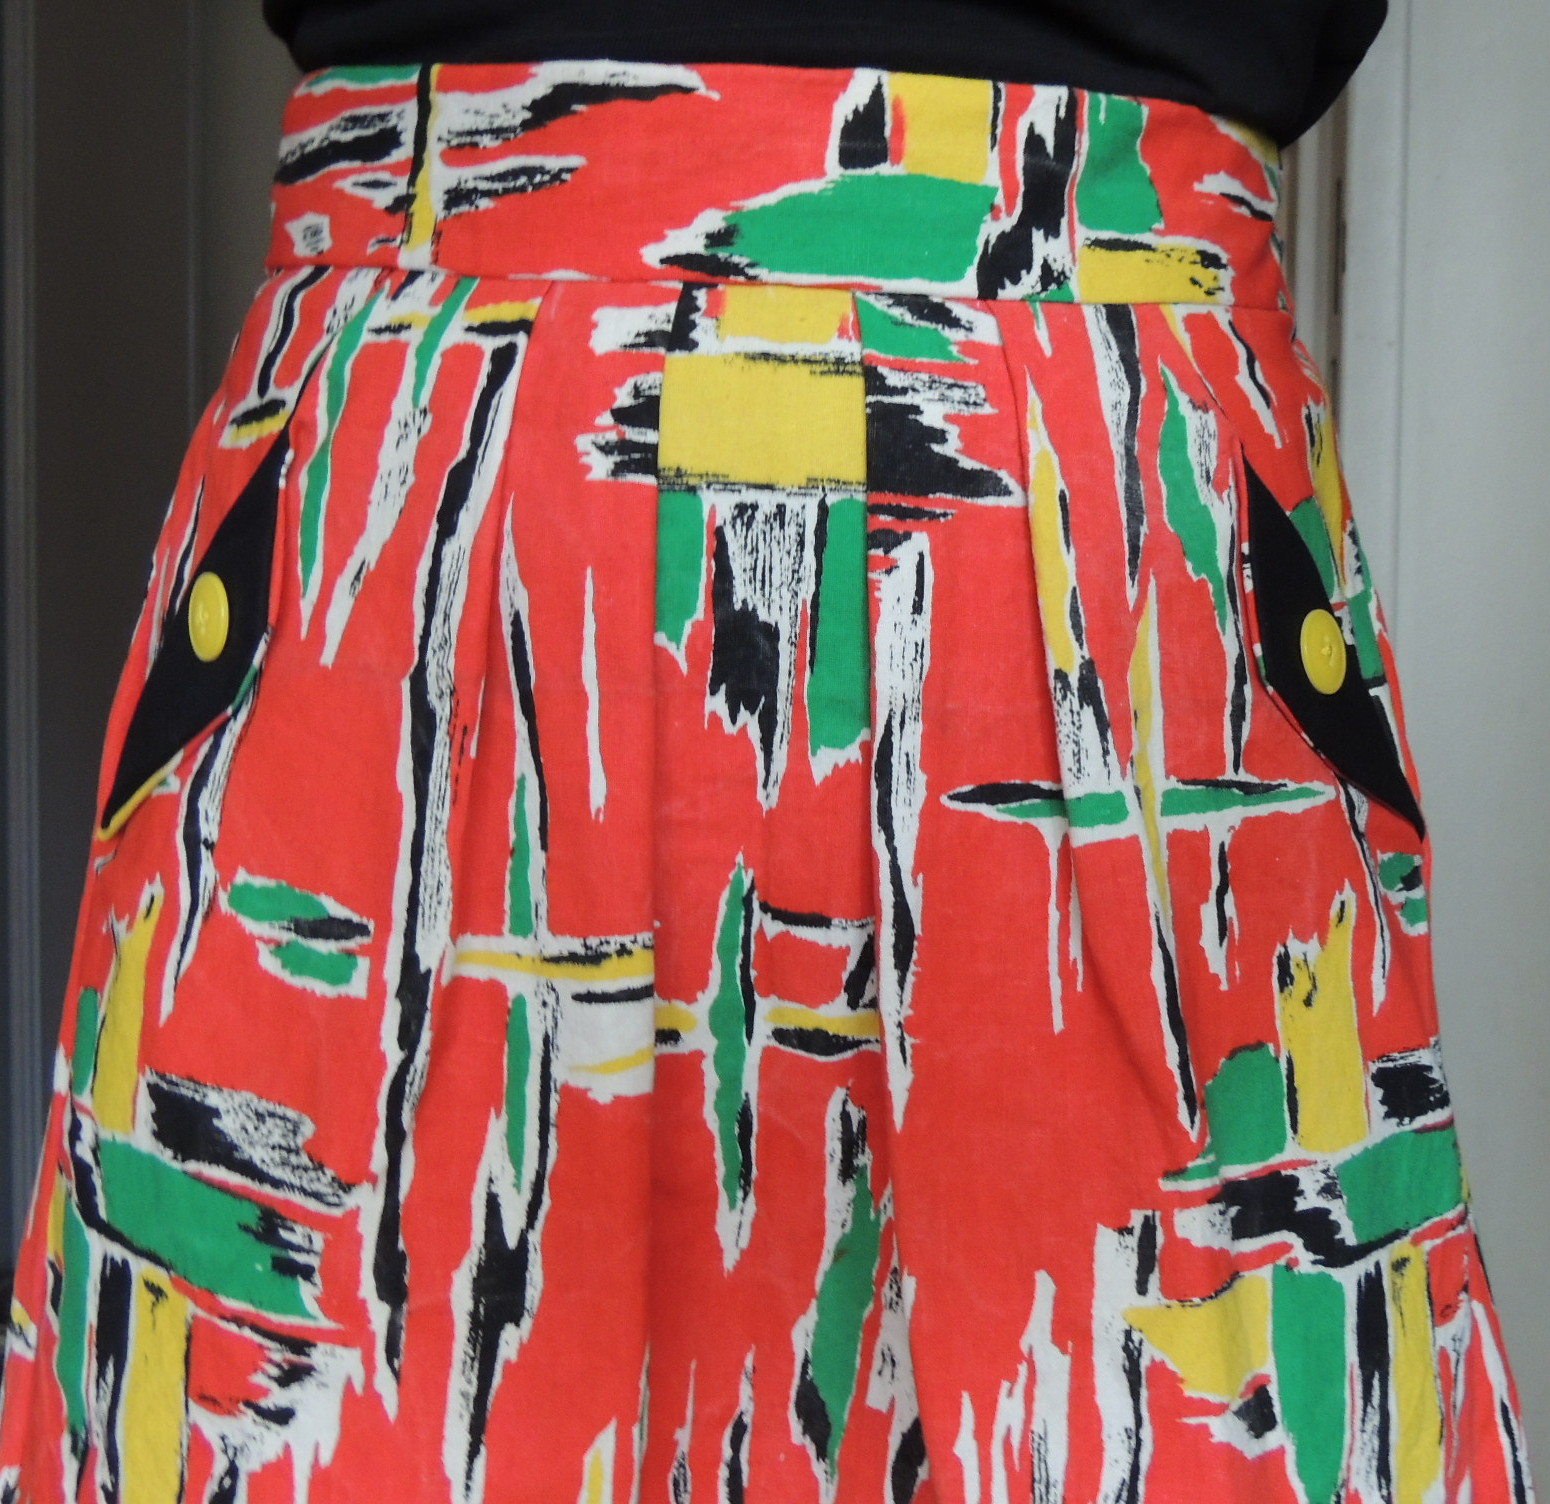 Mademoiselle wen une jupe lotta de la compagnie m en version vintage ann es 50 - Tissu vintage annees 50 ...